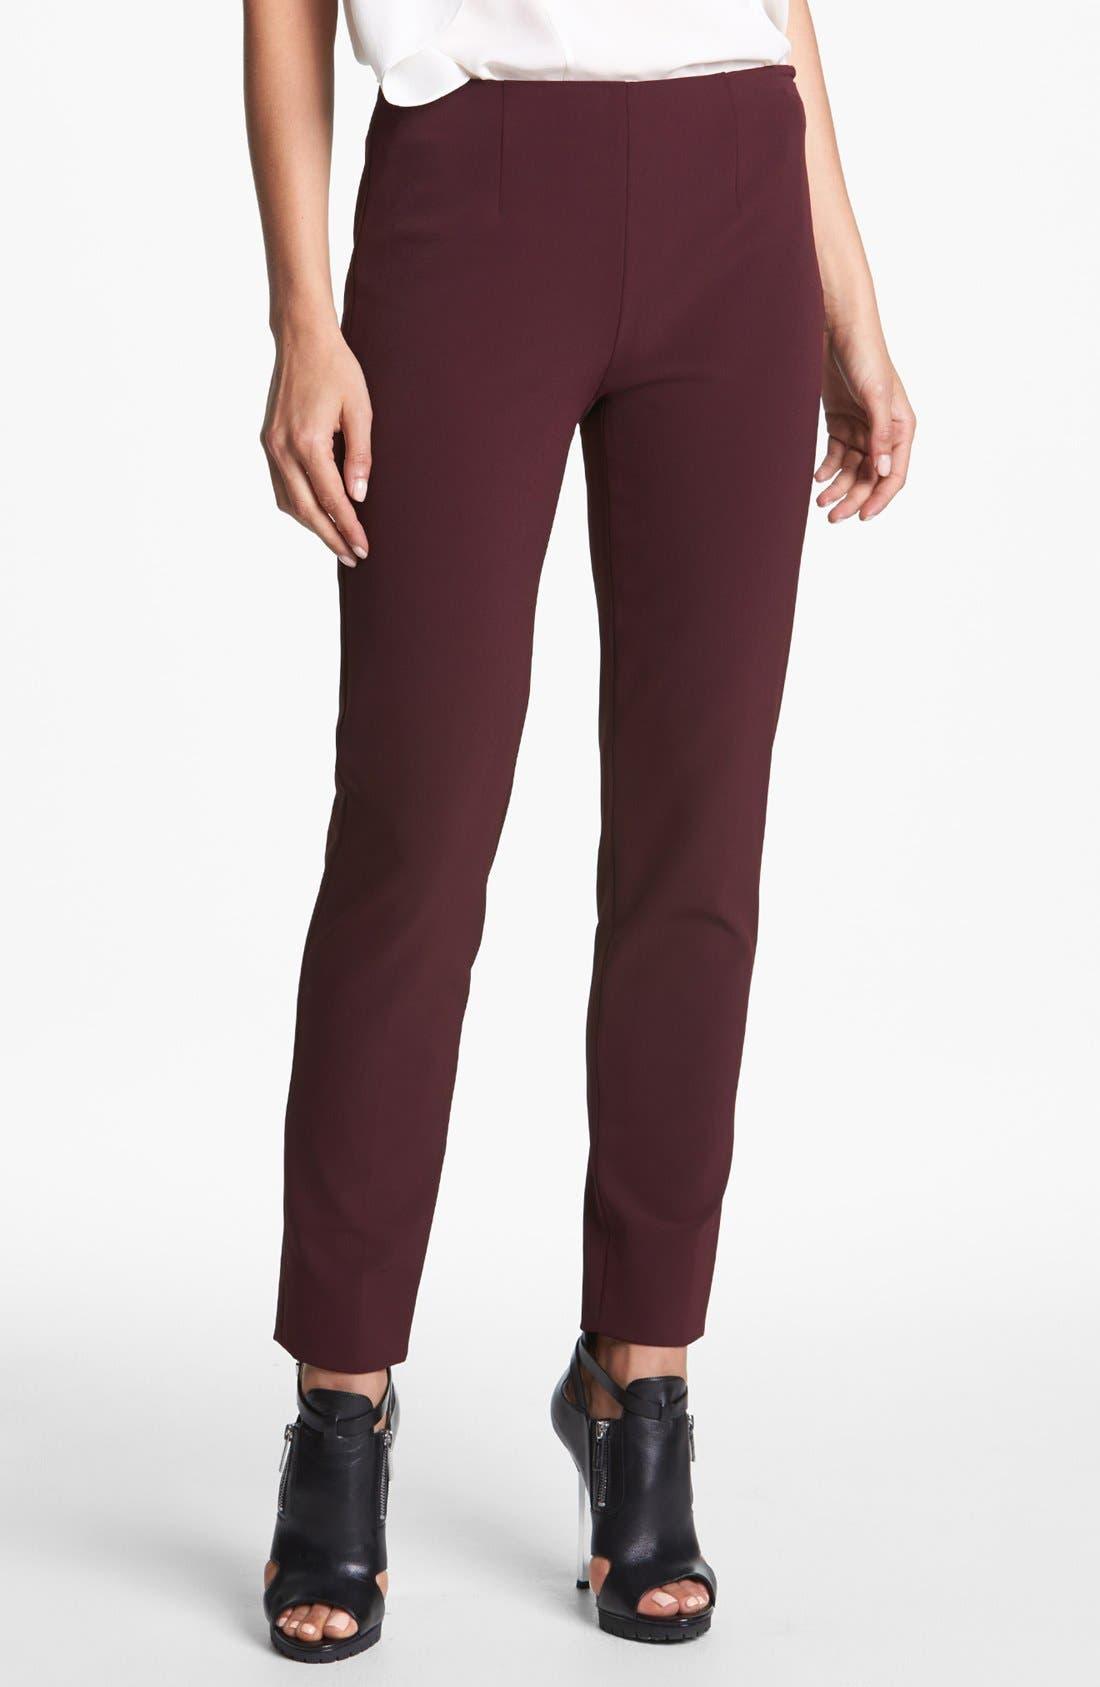 Alternate Image 1 Selected - Theory 'Belisa' Woven Pants